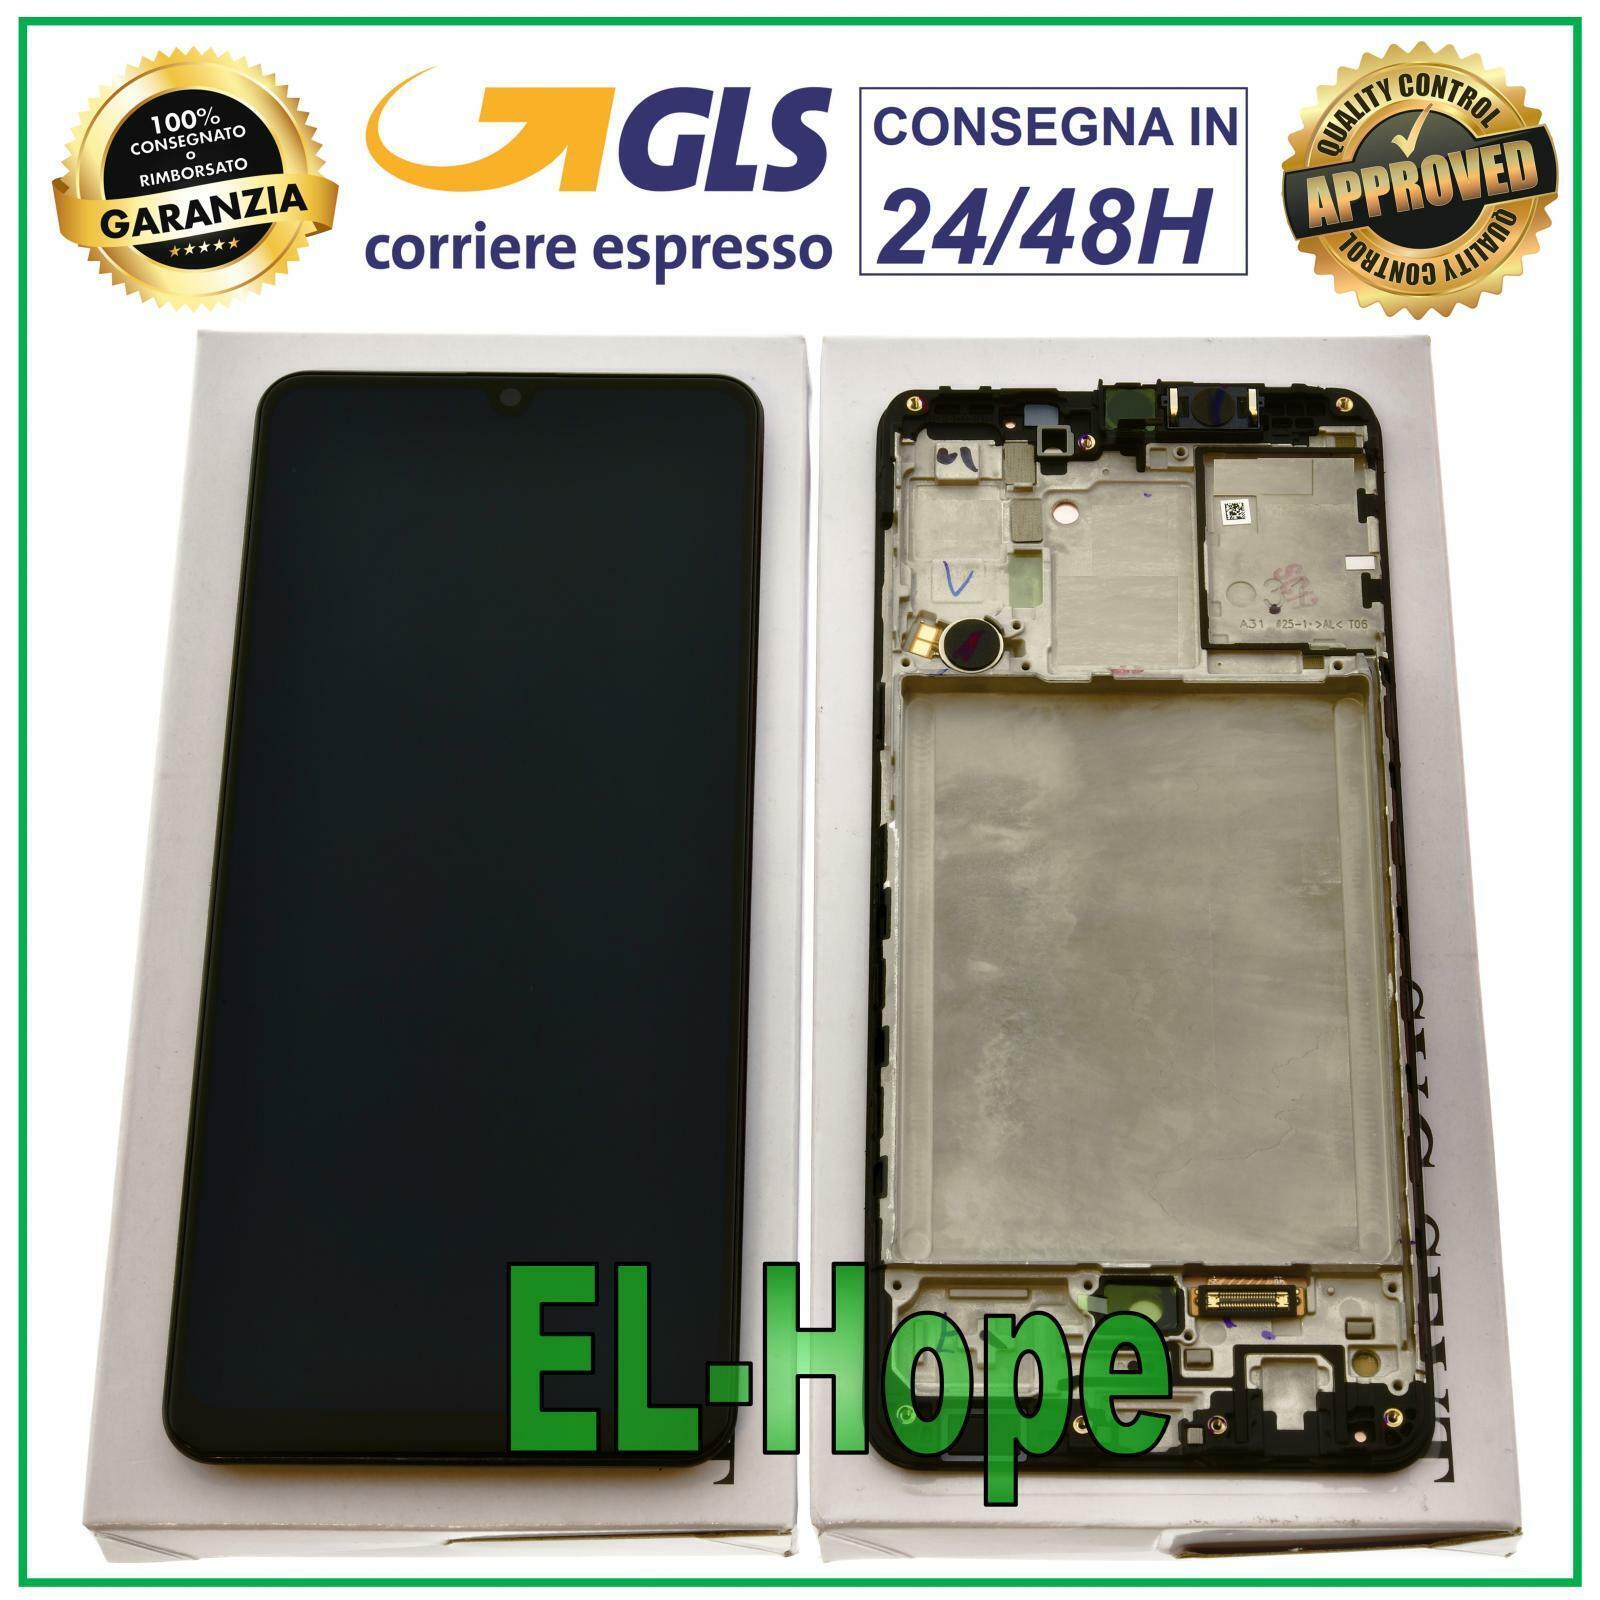 Samsung Galaxy: DISPLAY LCD ORIGINALE + FRAME SAMSUNG GALAXY A31 SM-A315F A315 TOUCH SCREEN NERO